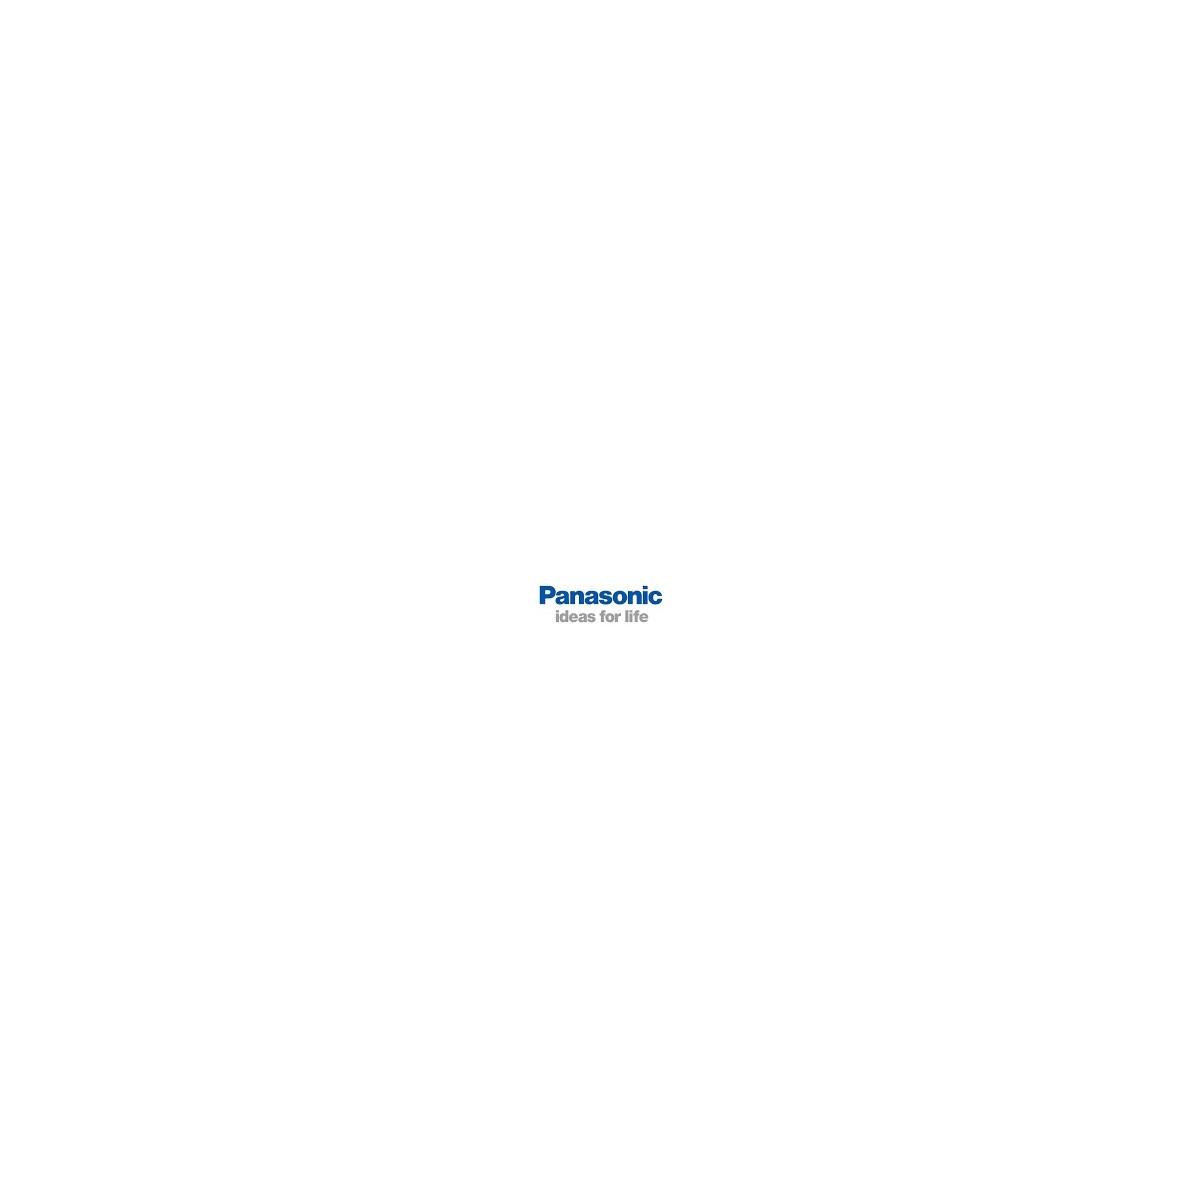 Panasonic NSX Expansion Box